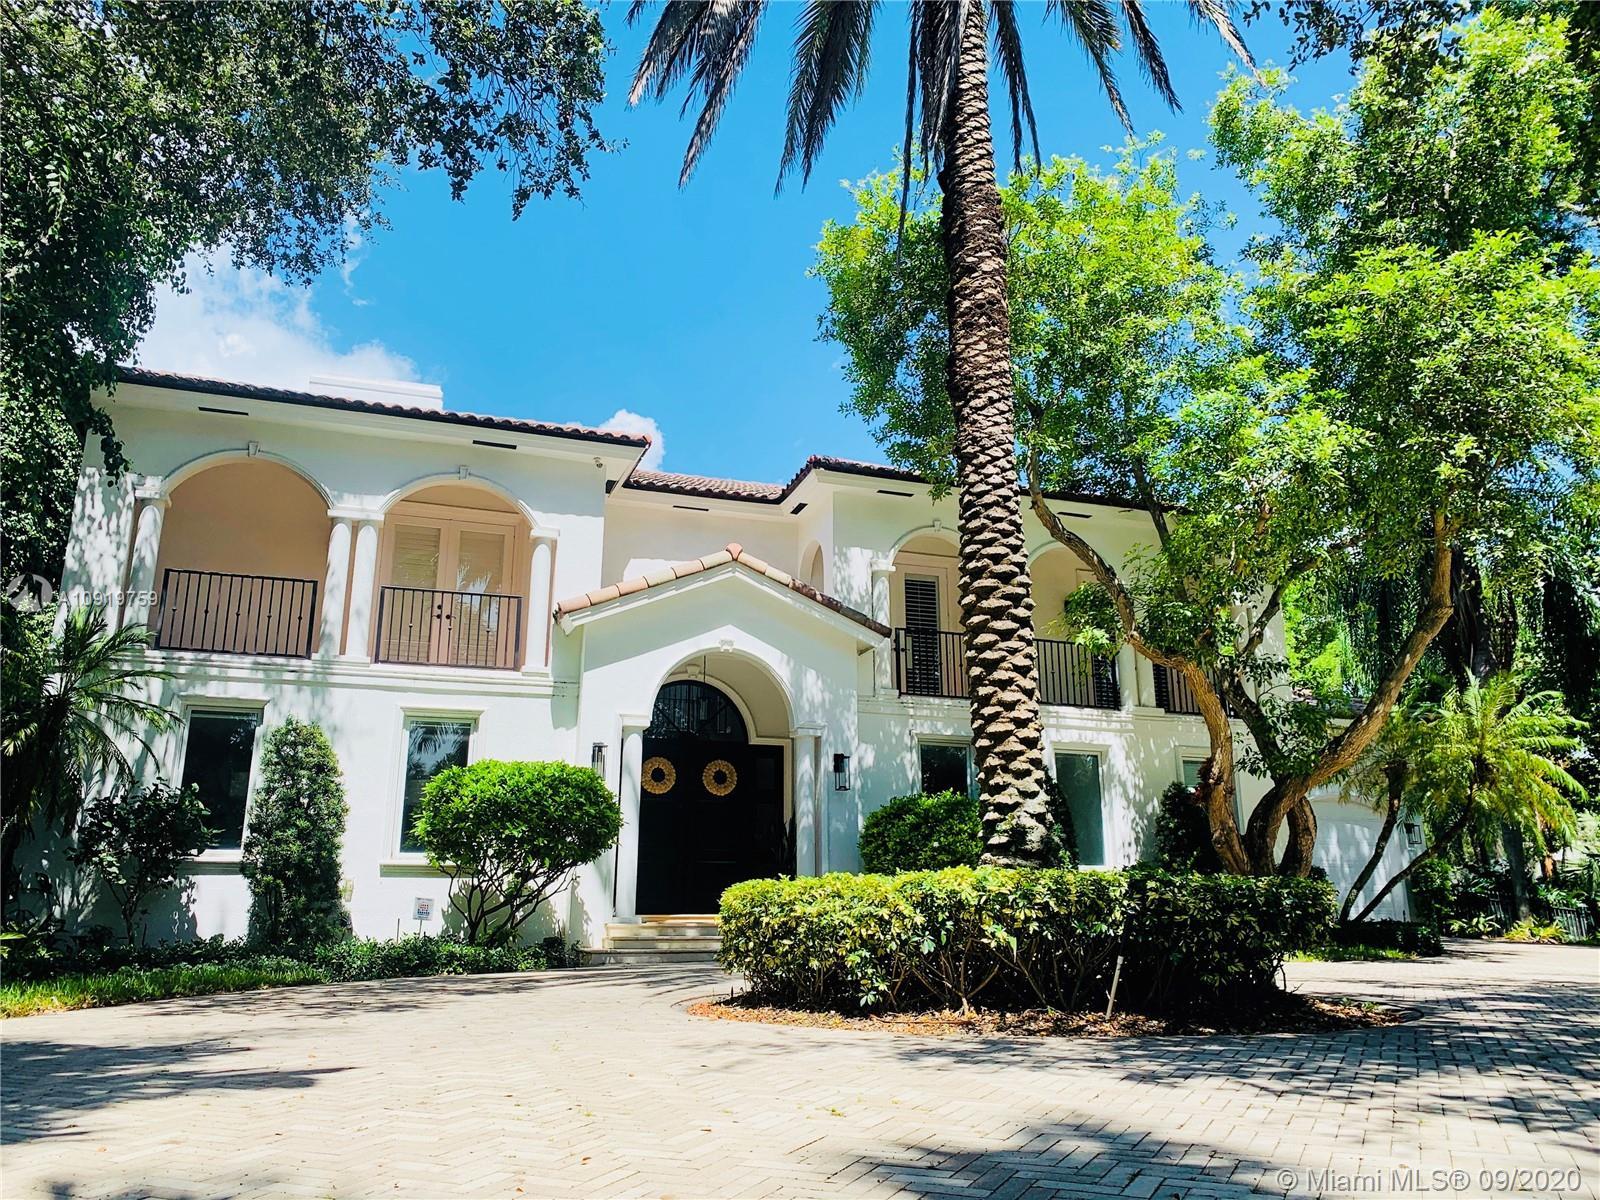 South Miami - 166 Isla Dorada Blvd, Coral Gables, FL 33143